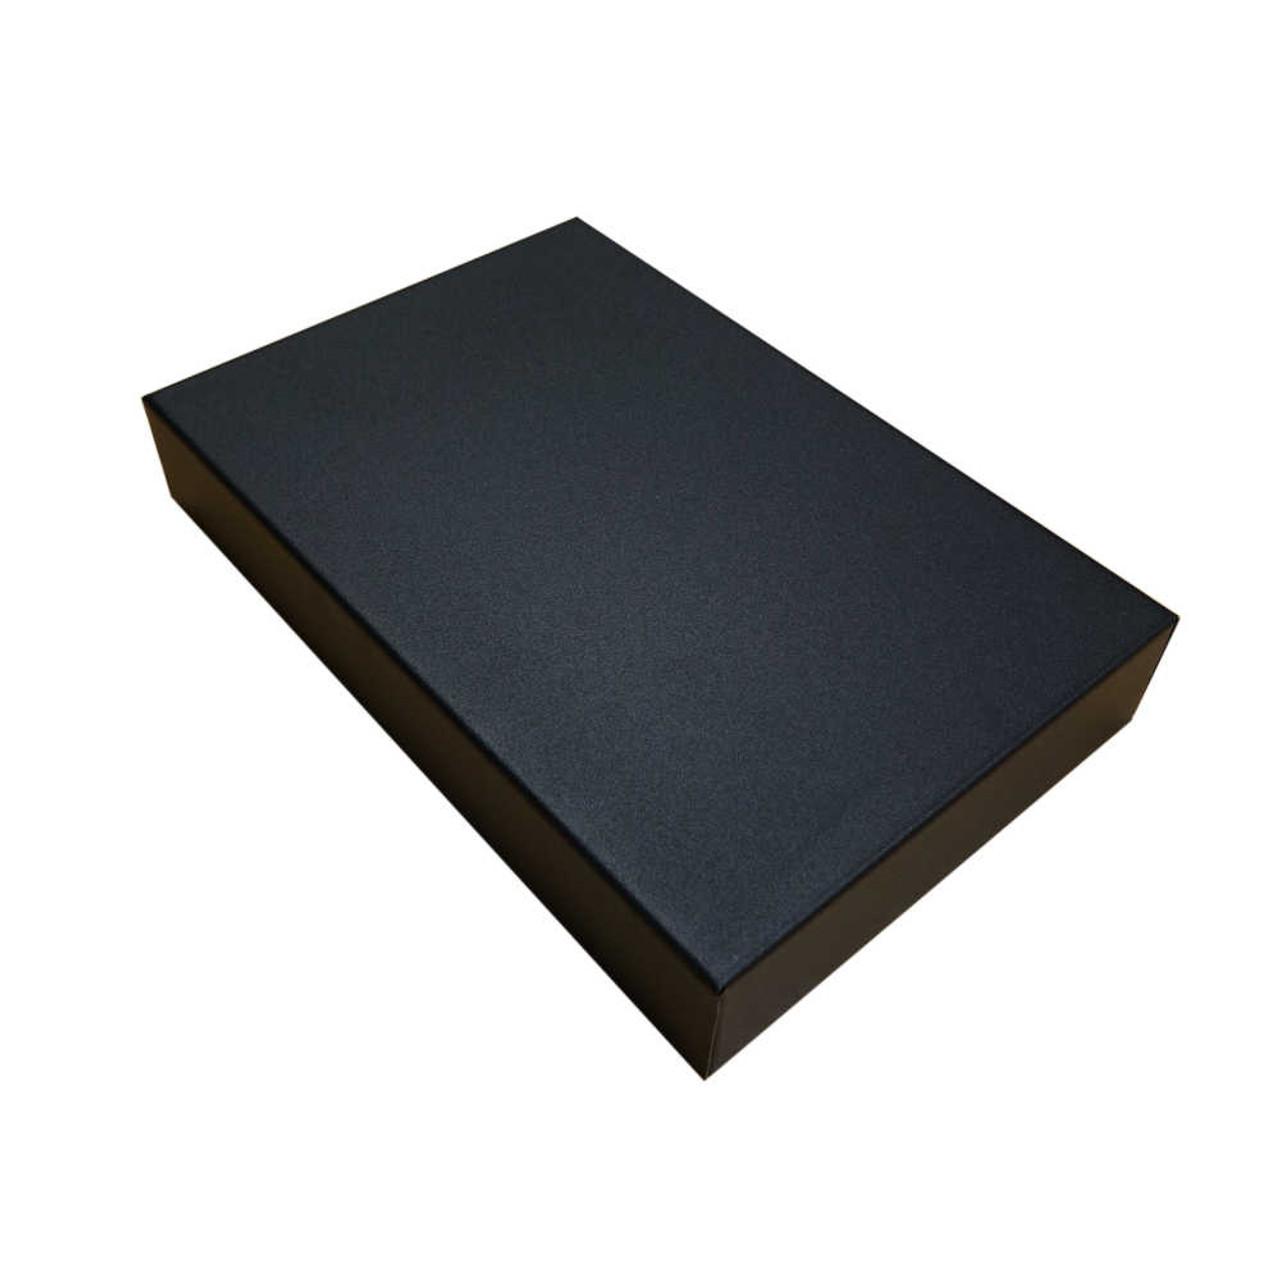 Hammond 1441-22BK3 - Black Steel Chassis 12x8x2